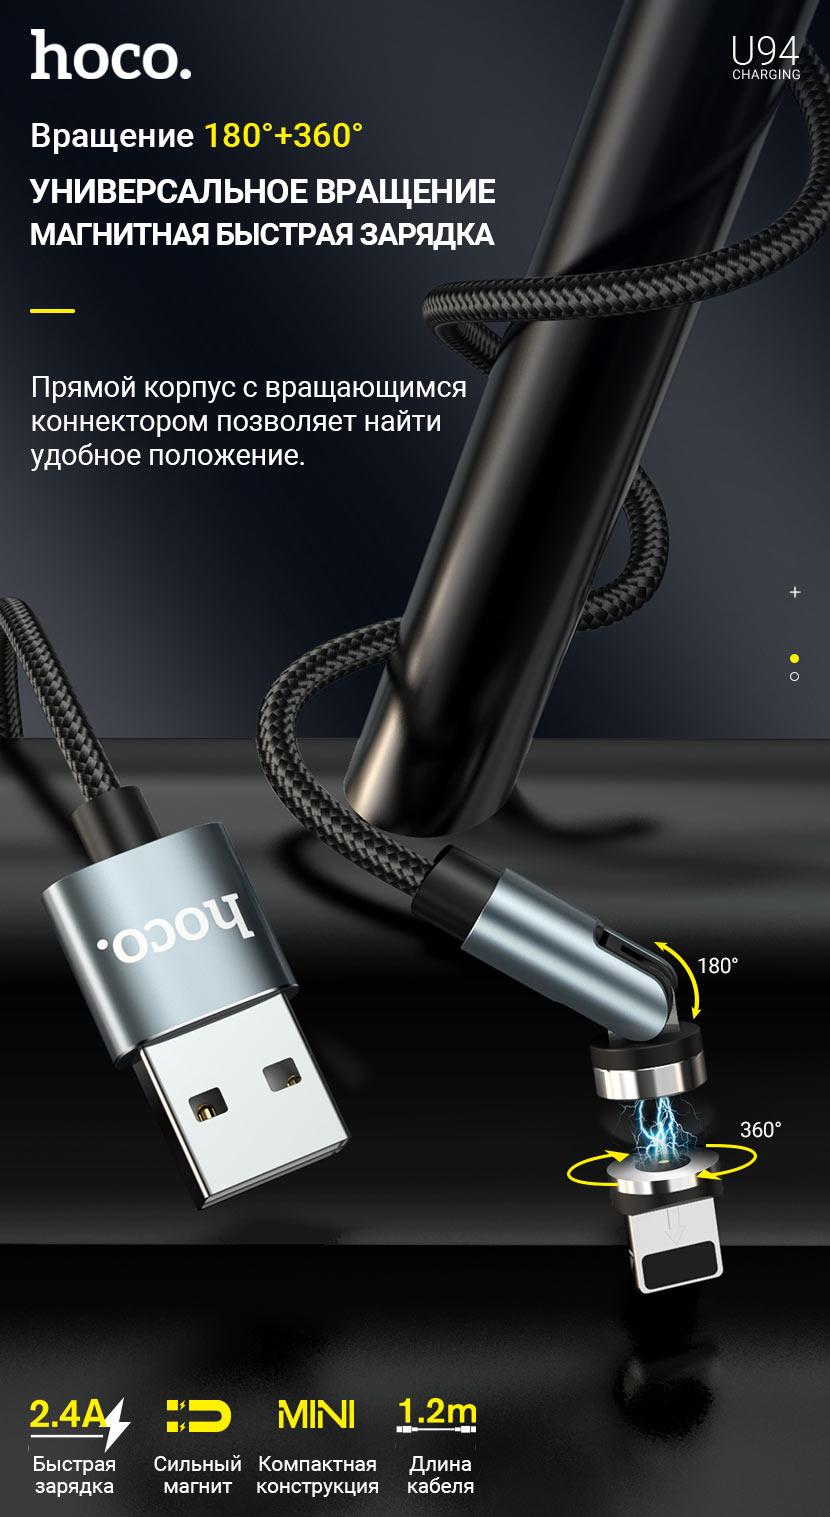 hoco news u94 universal rotating magnetic charging cable rotation ru